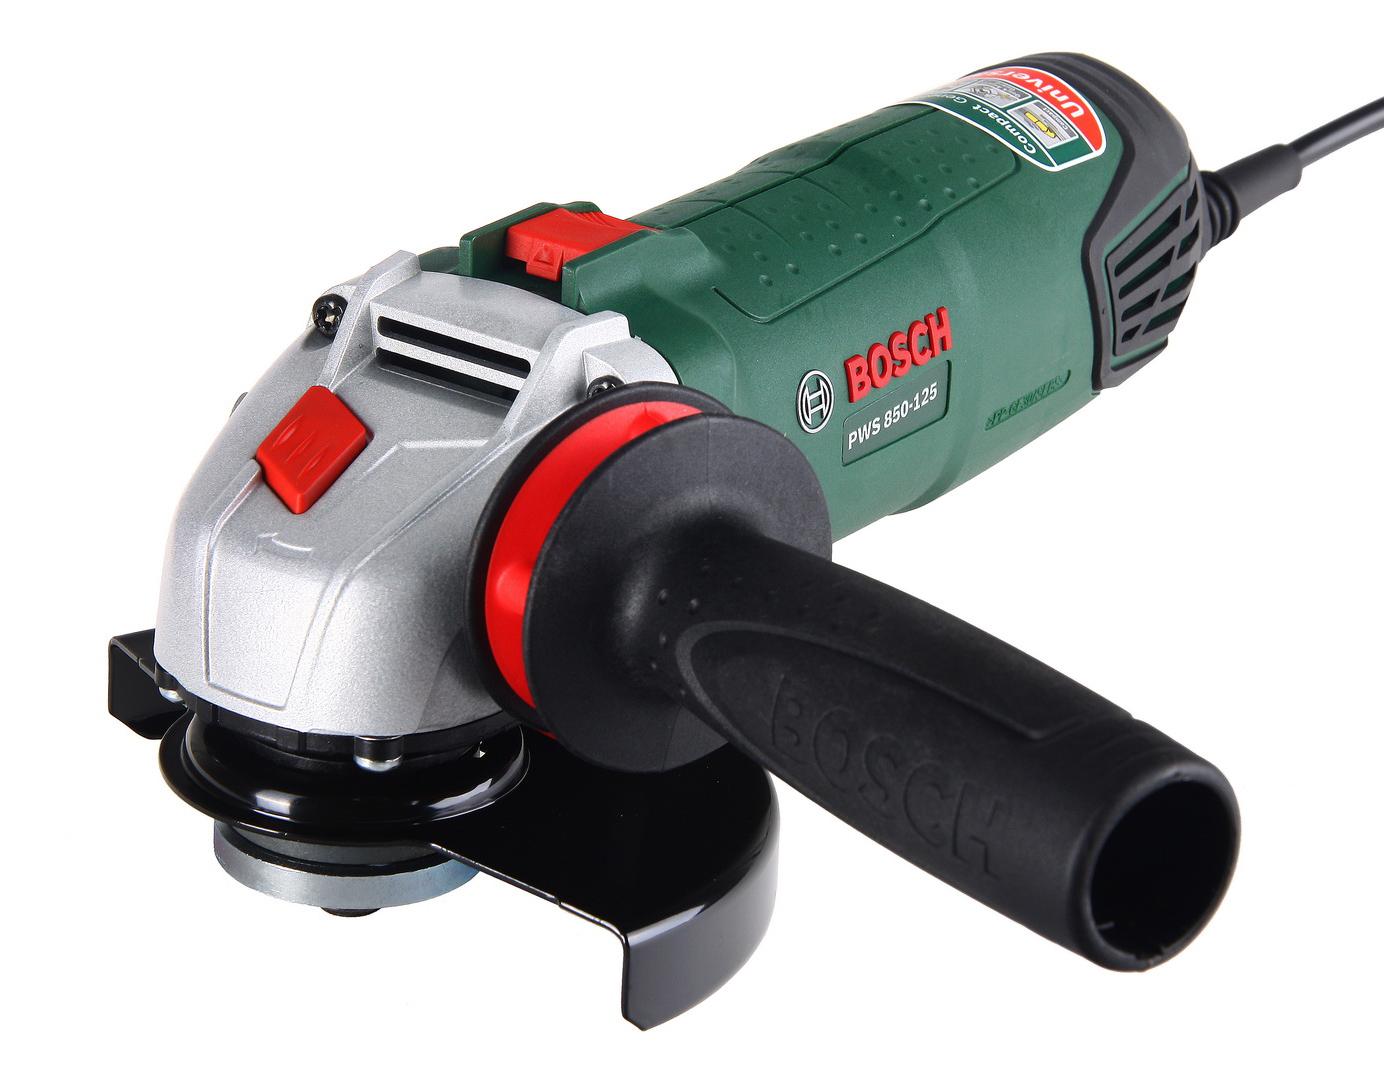 УШМ (болгарка) Bosch Pws 850-125 (0.603.3a2.720) болгарка bosch pws 850 125